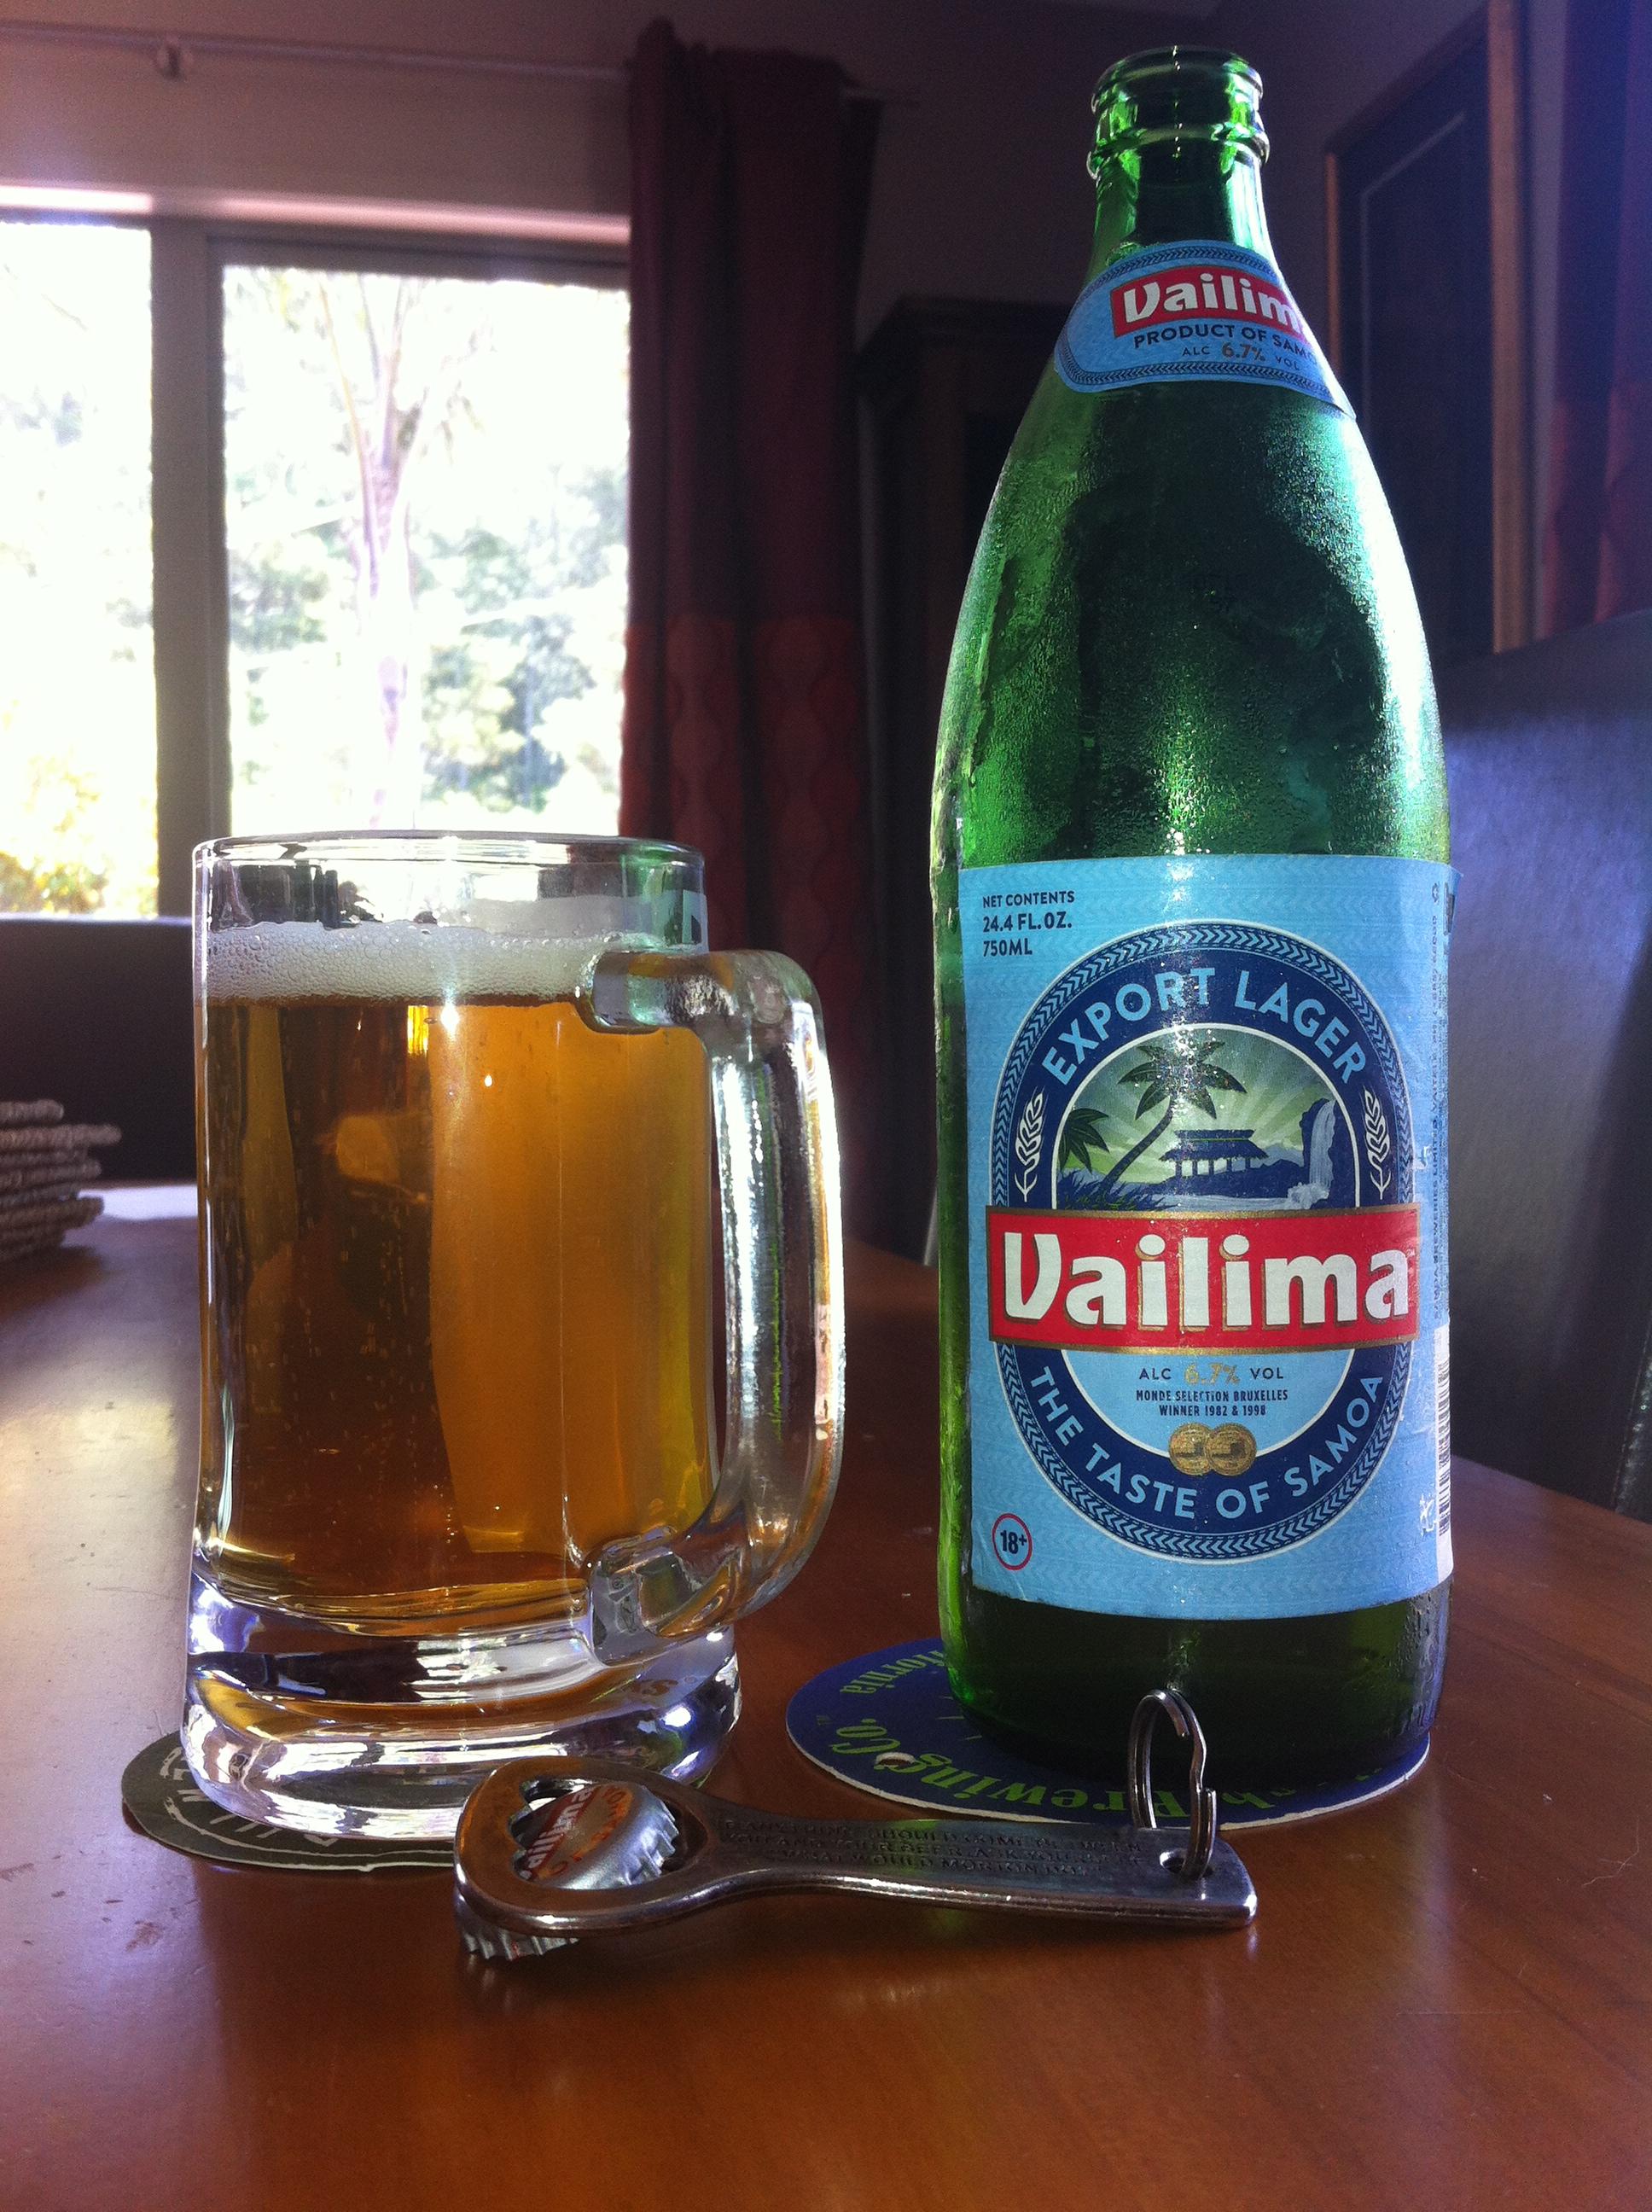 beer  u2013  533  u2013 vailima  u2013 special export lager